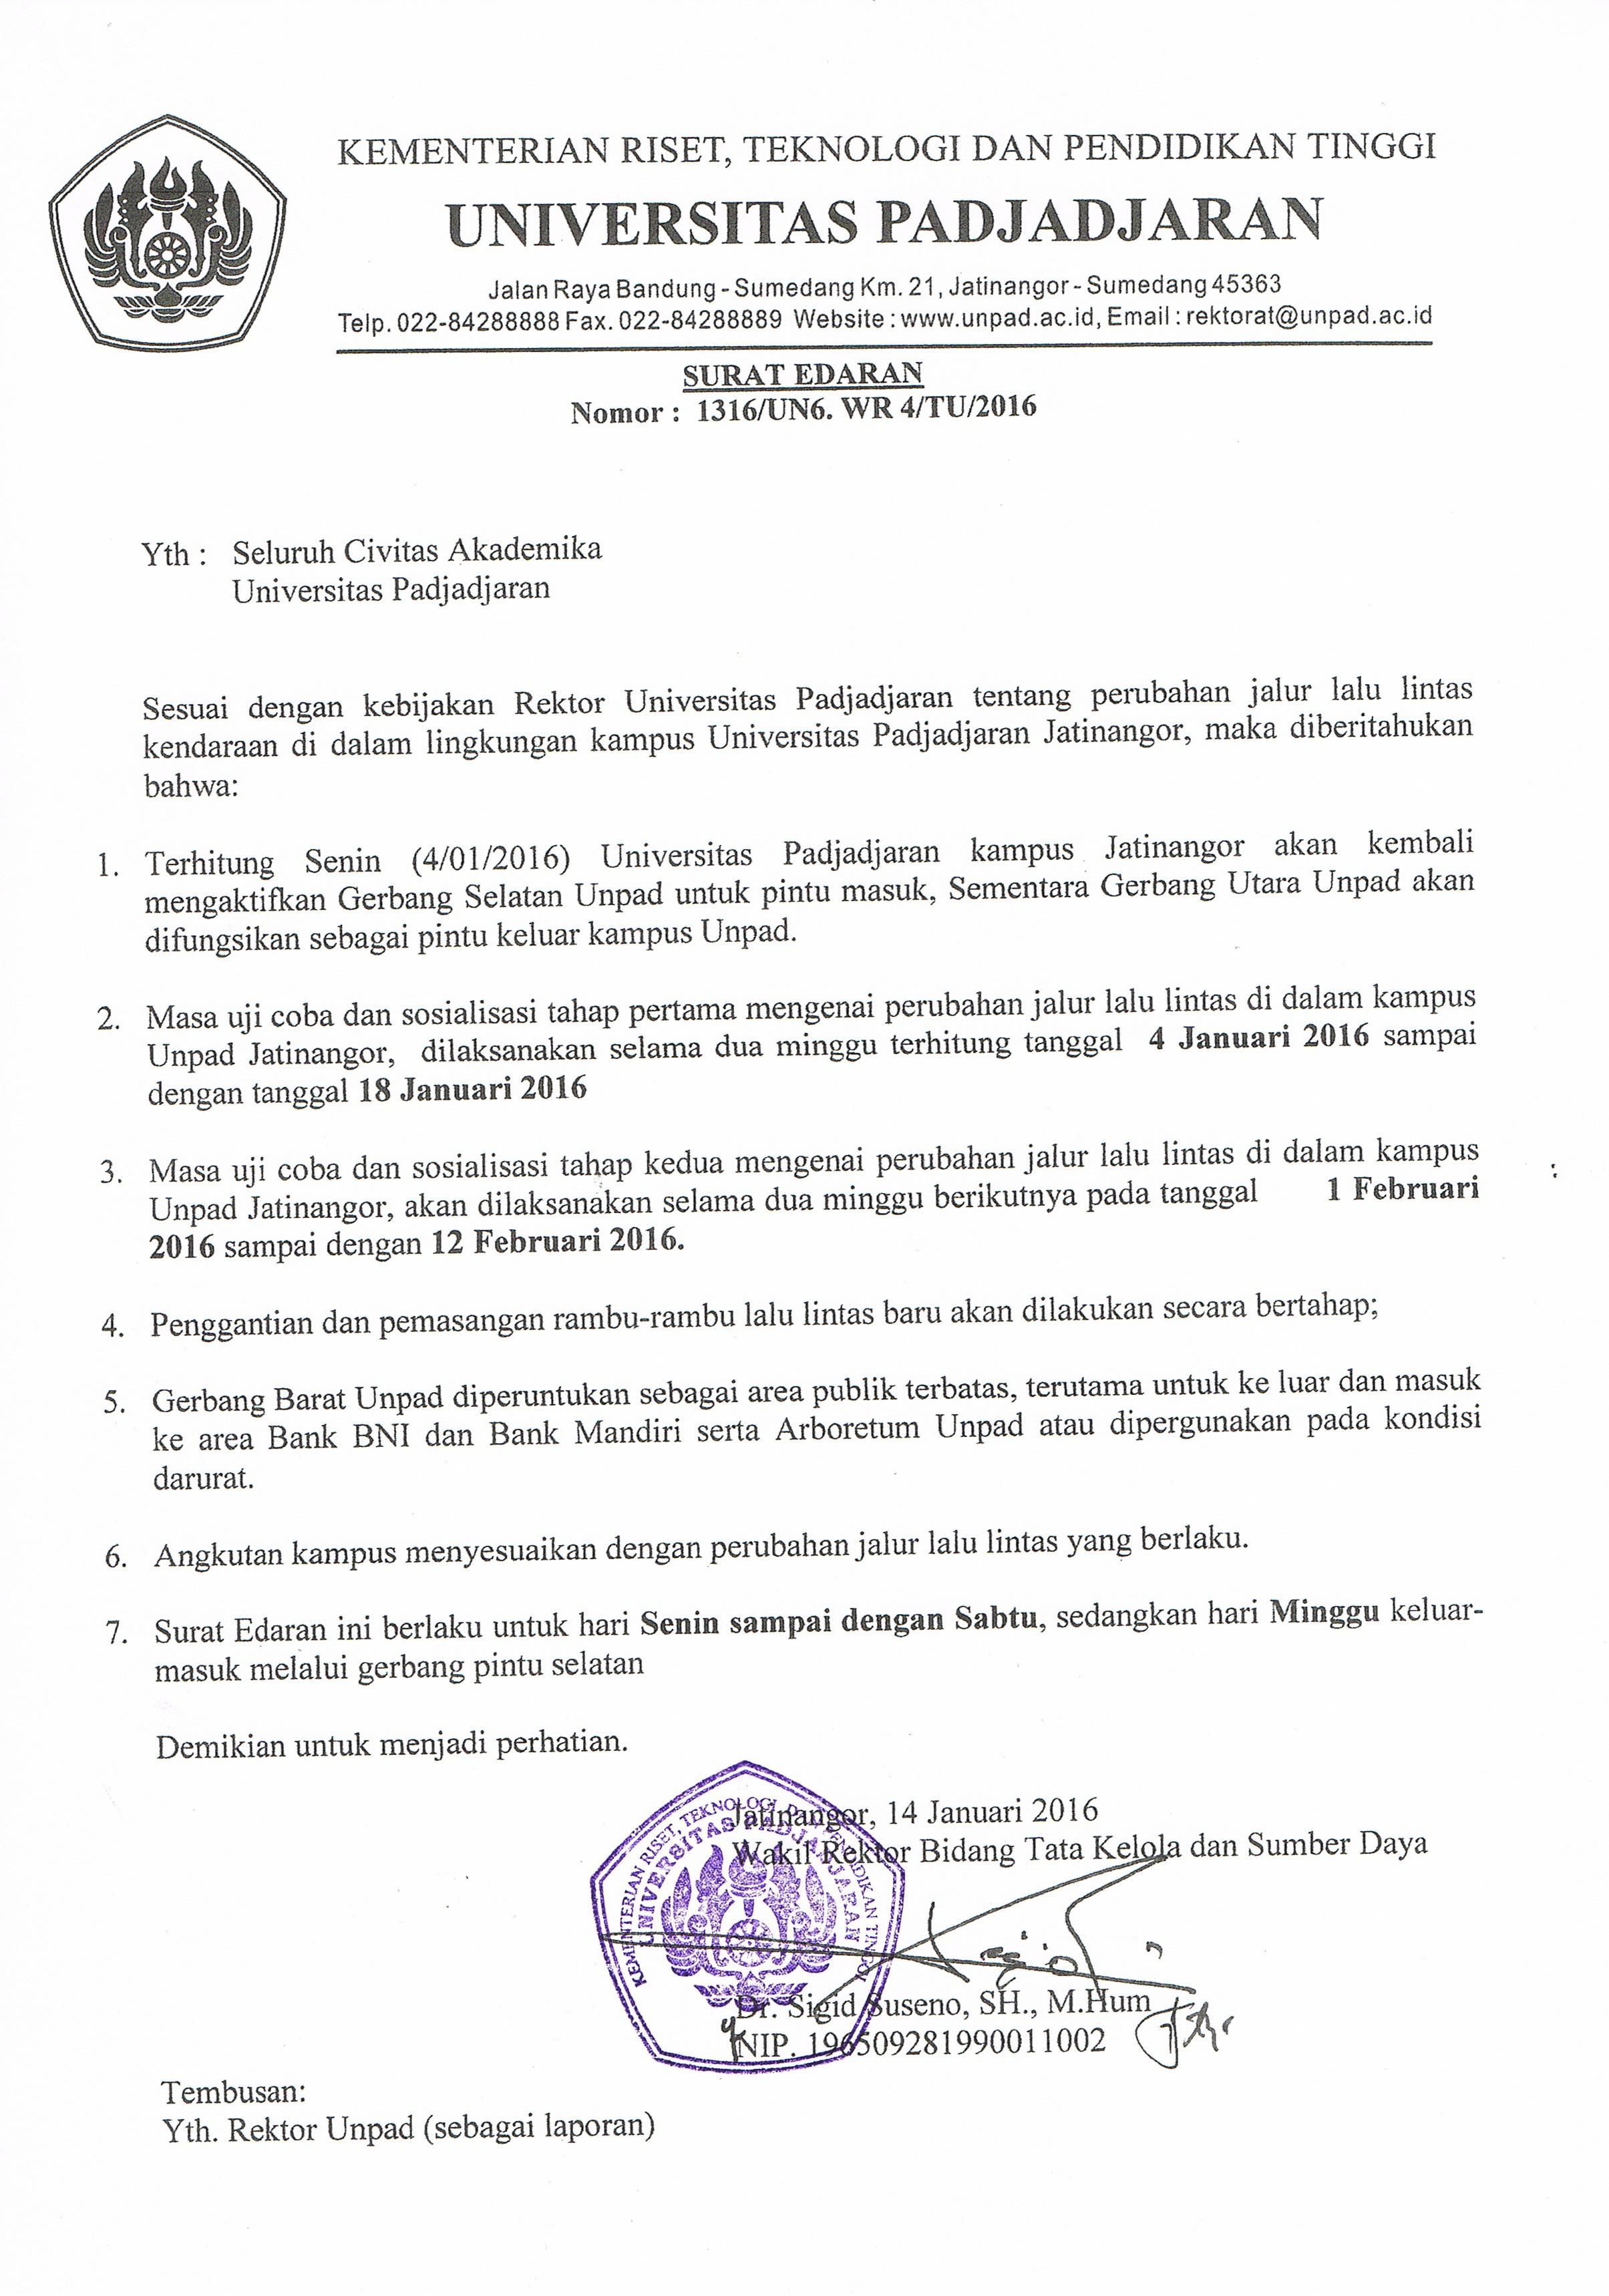 Circular Letter Of Vehicle Traffic Changes At Jatinangor Campus